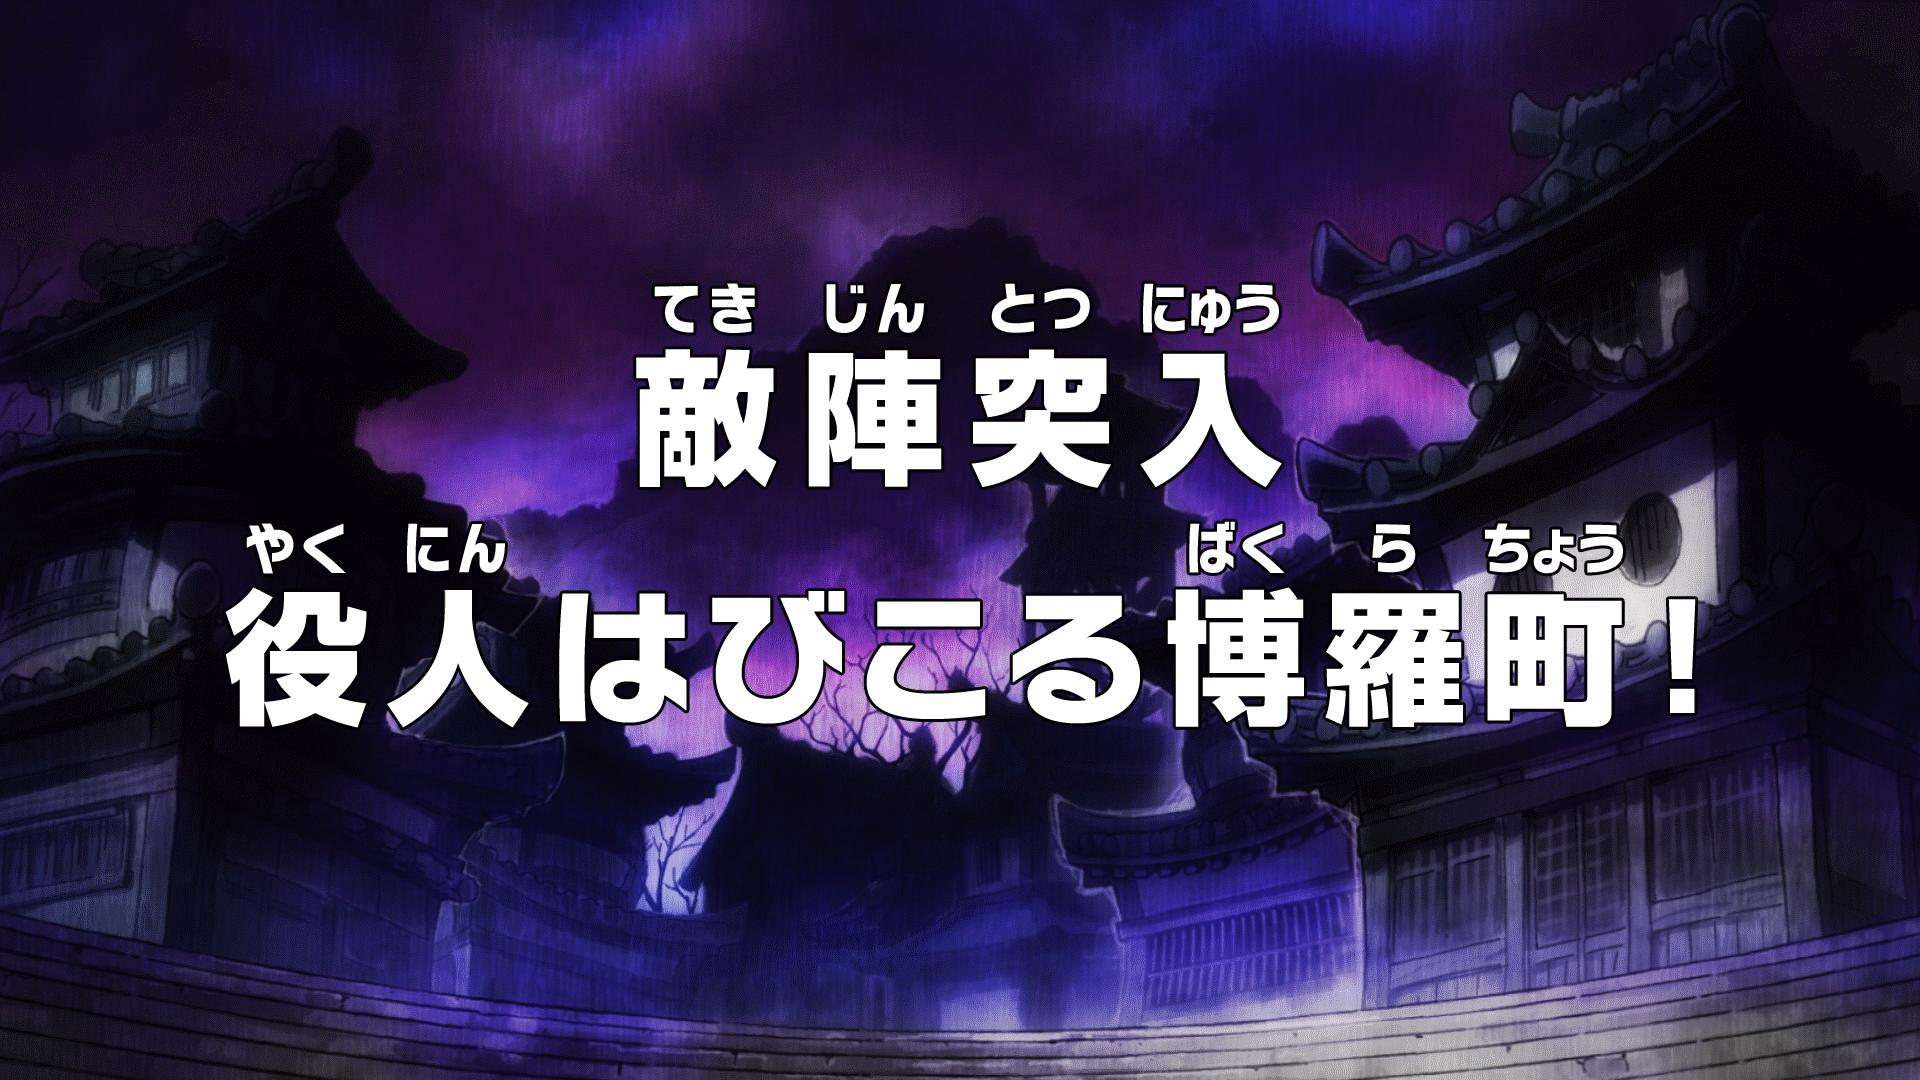 Episode 901